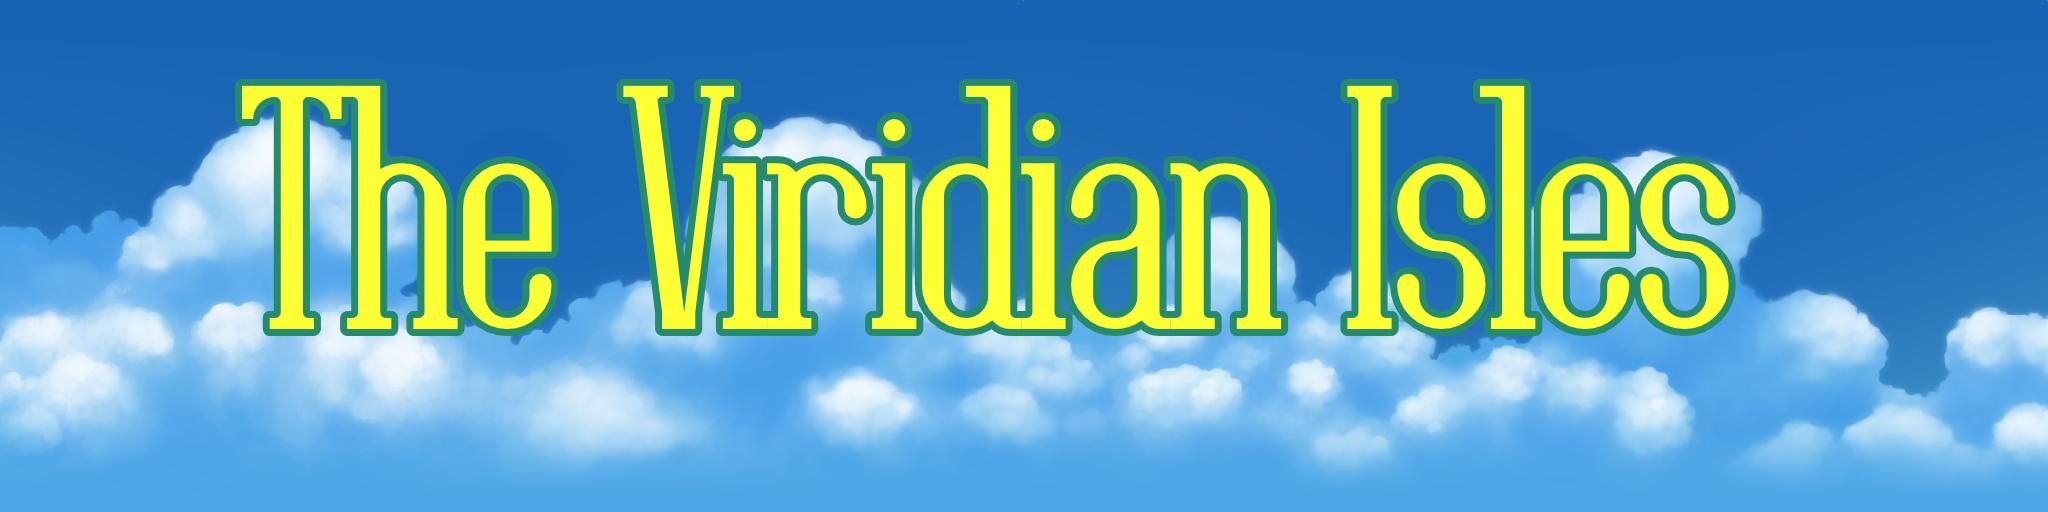 The Viridian Isles